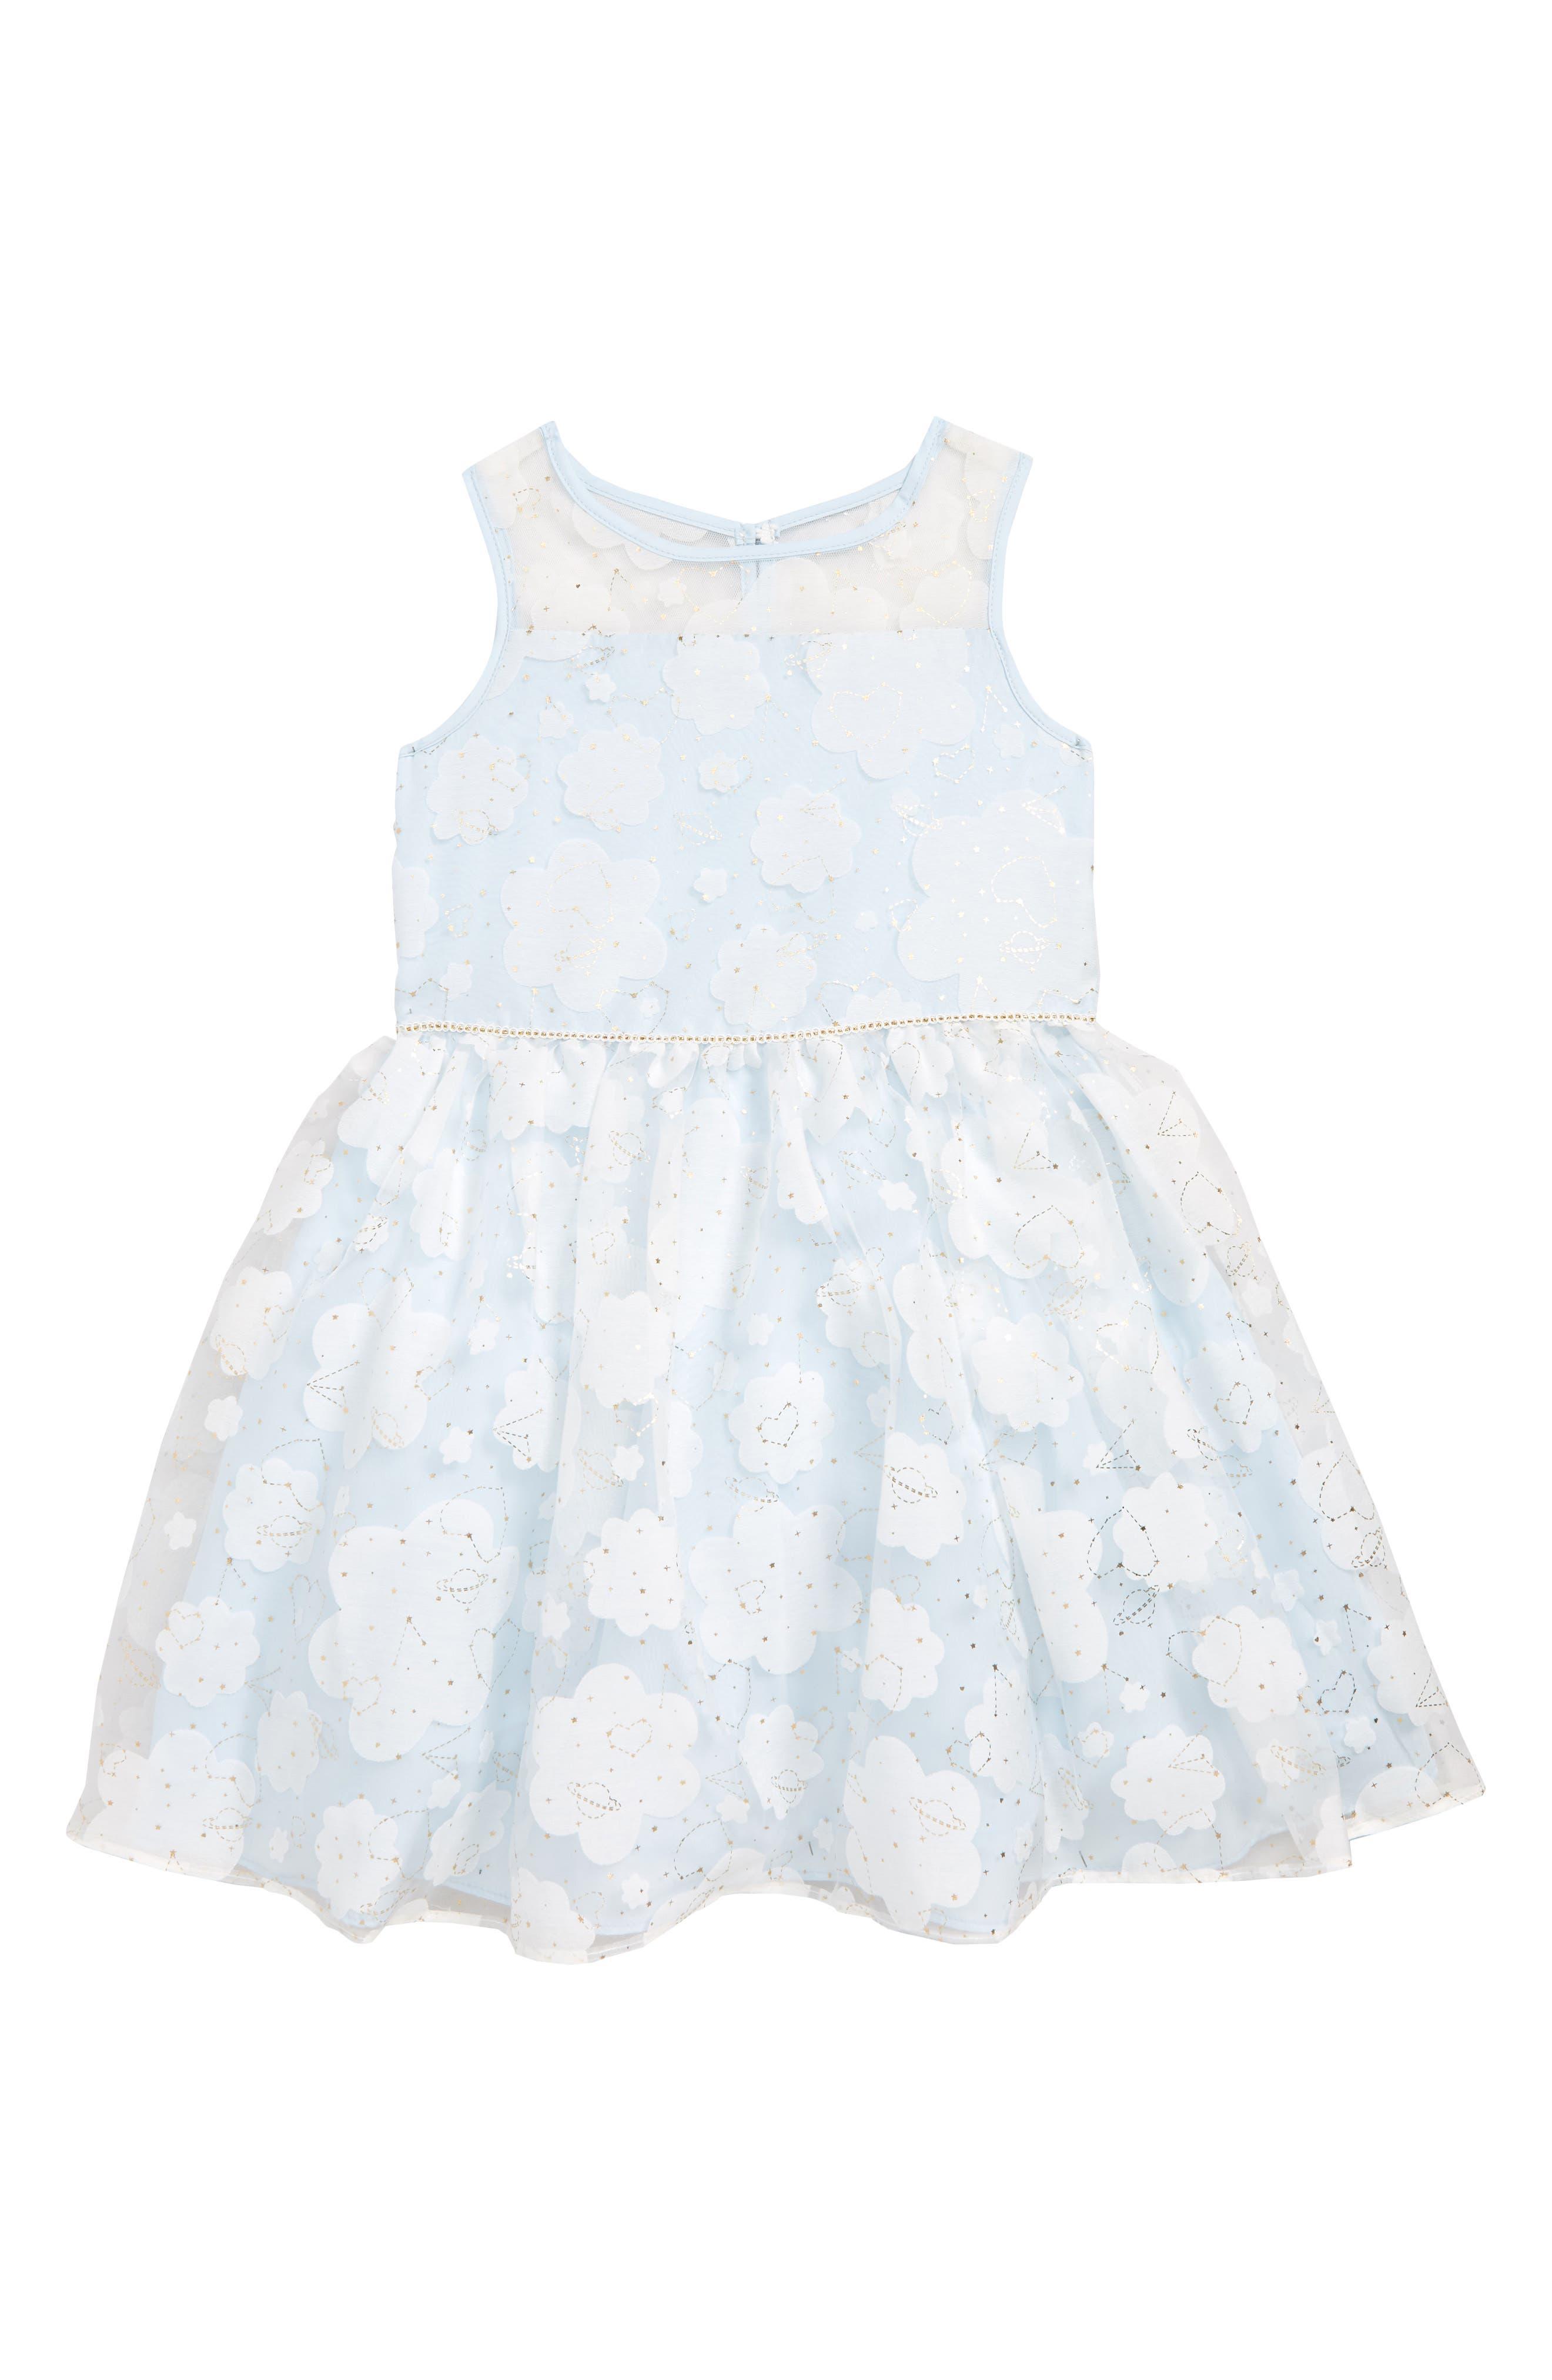 PIPPA & JULIE, Constellation Burnout Dress, Main thumbnail 1, color, WHITE/ GOLD